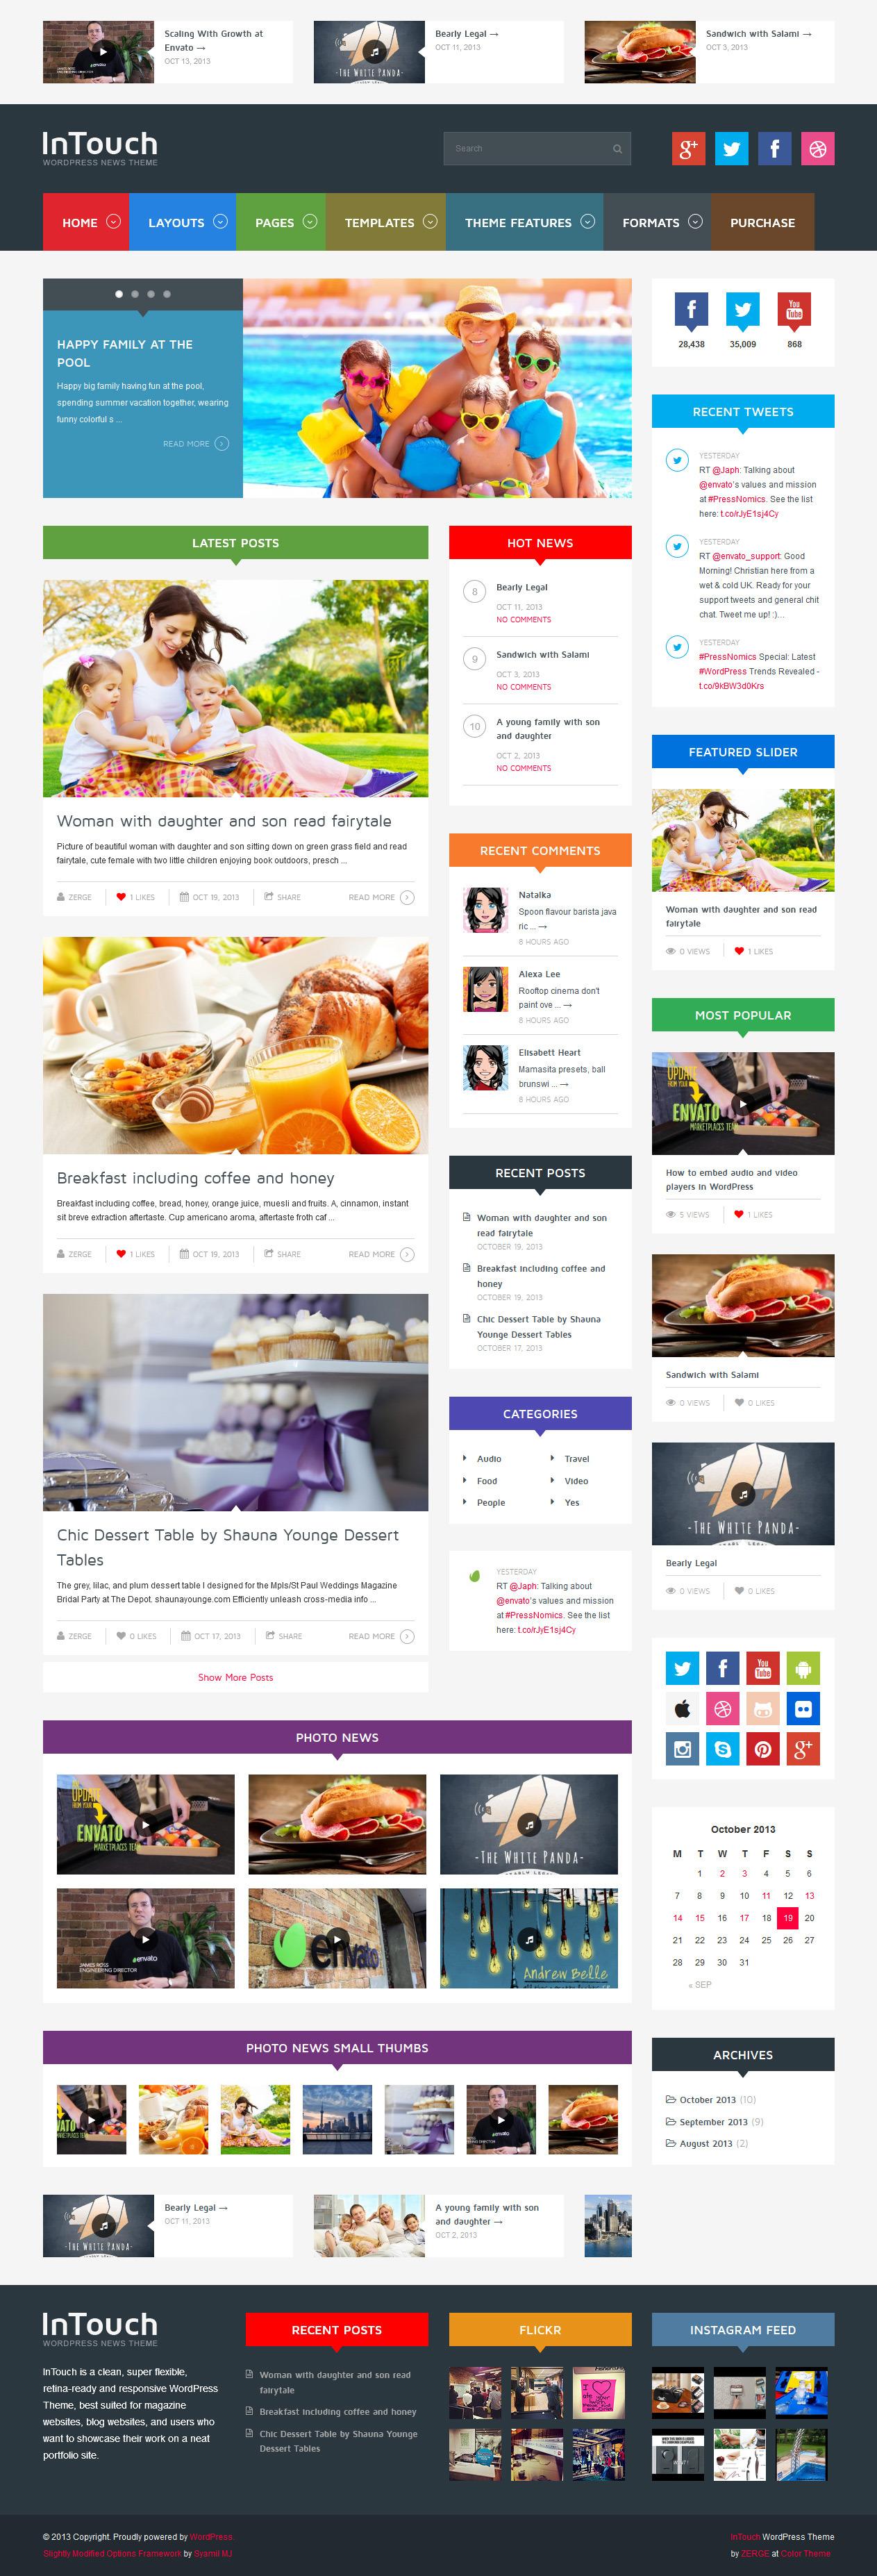 InTouch - Retina Responsive WordPress News Theme - Home Page